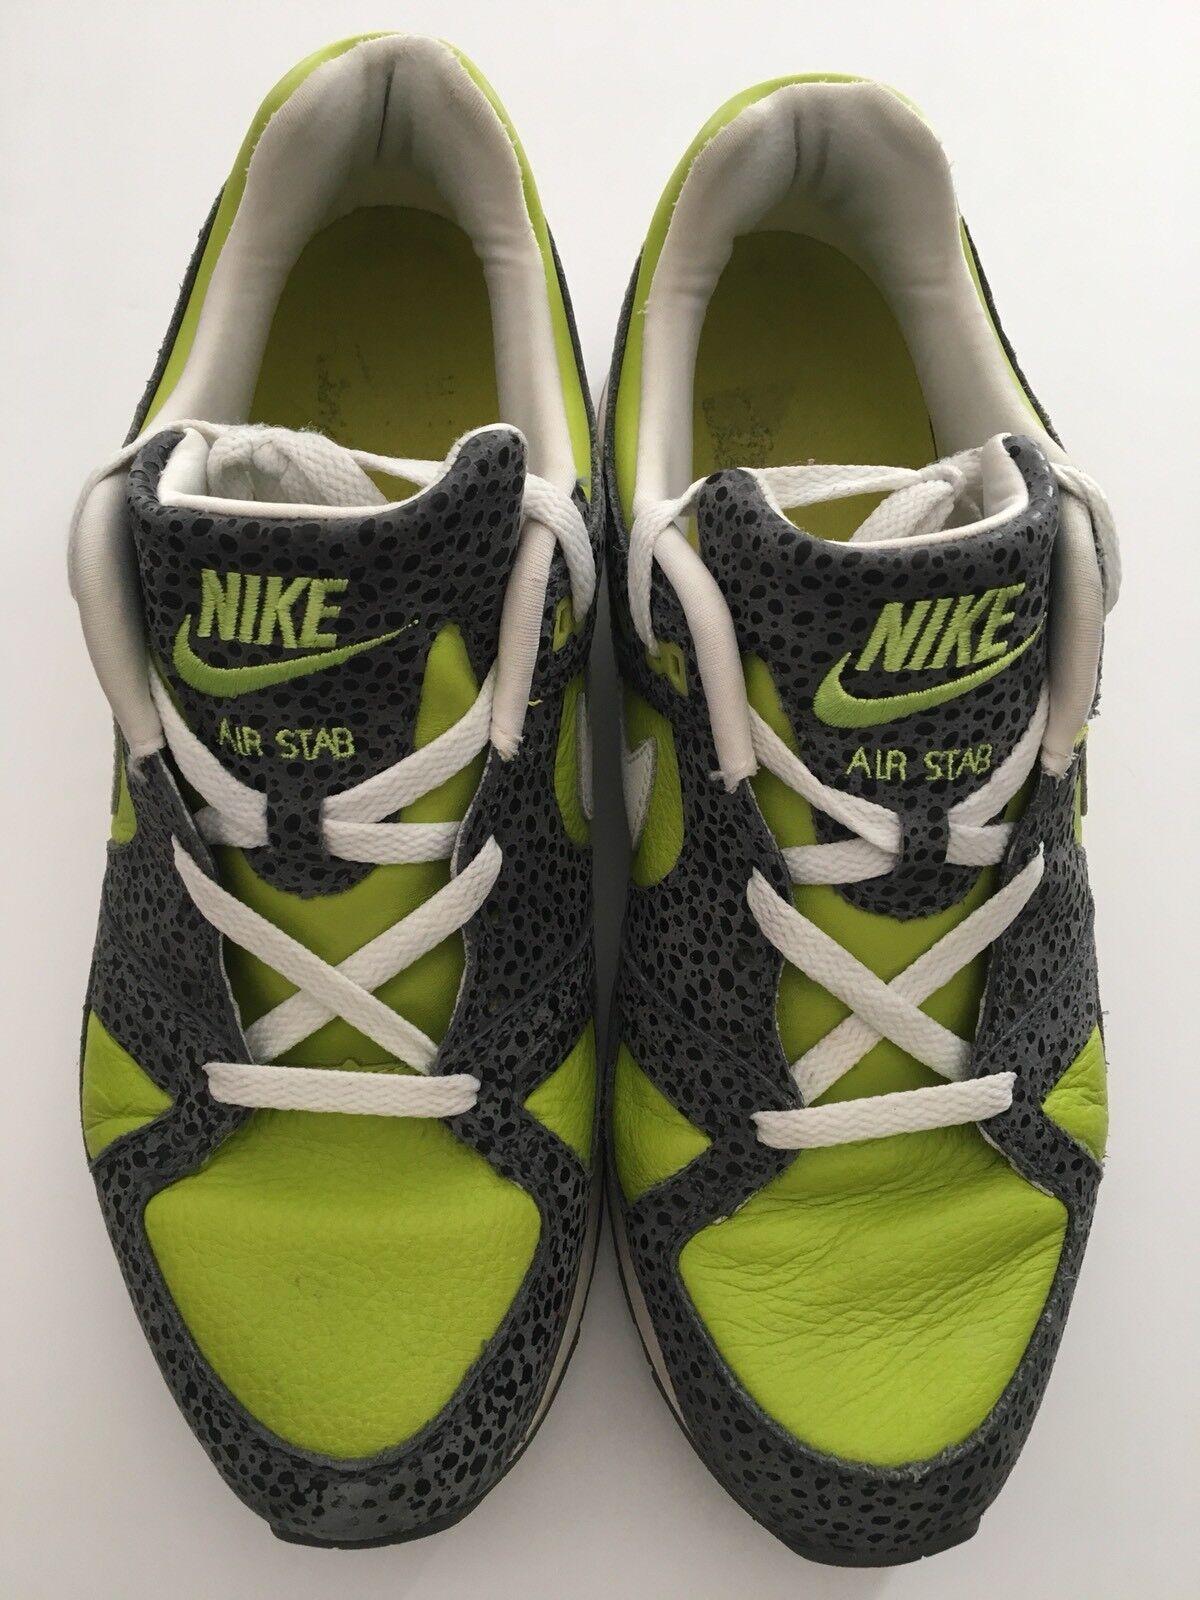 Nike Air Stab Premium Cactus Pack Safari 2007 Sz 10.5 M 316402 311 Parra Patta